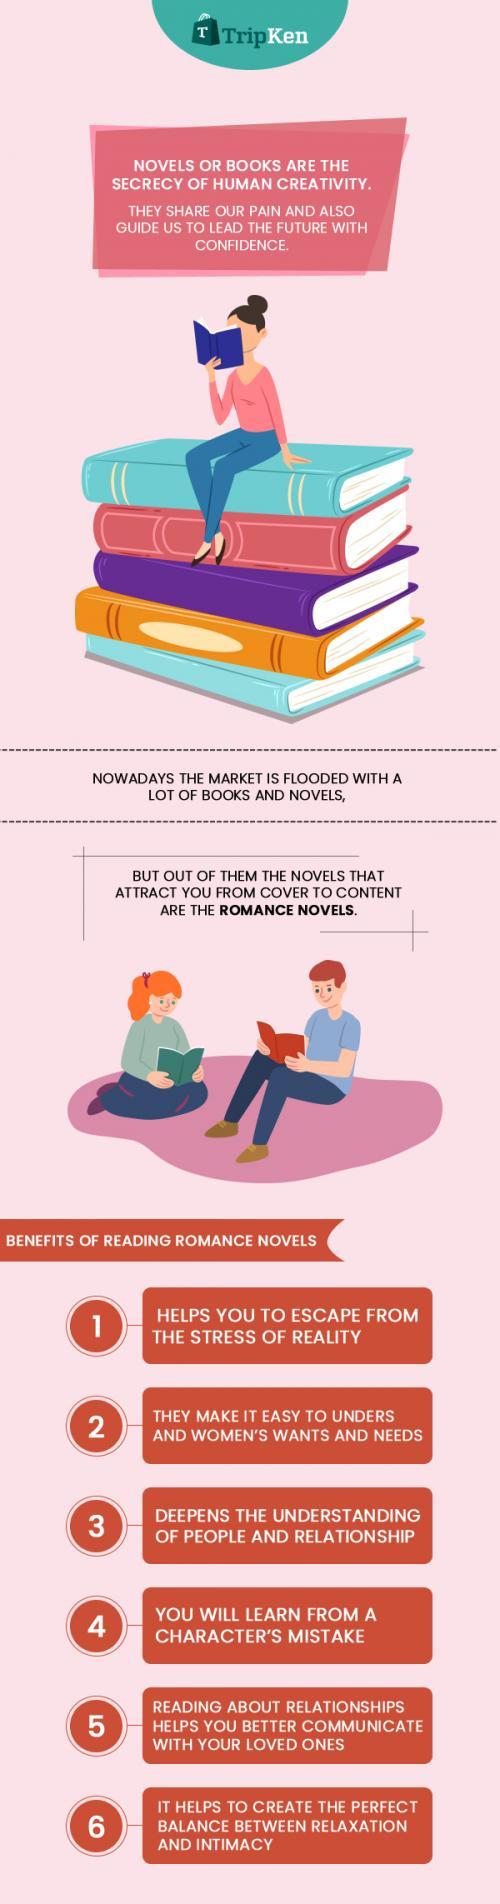 TripKen Ads One-Stop Source to SellBuy Romance Series Books